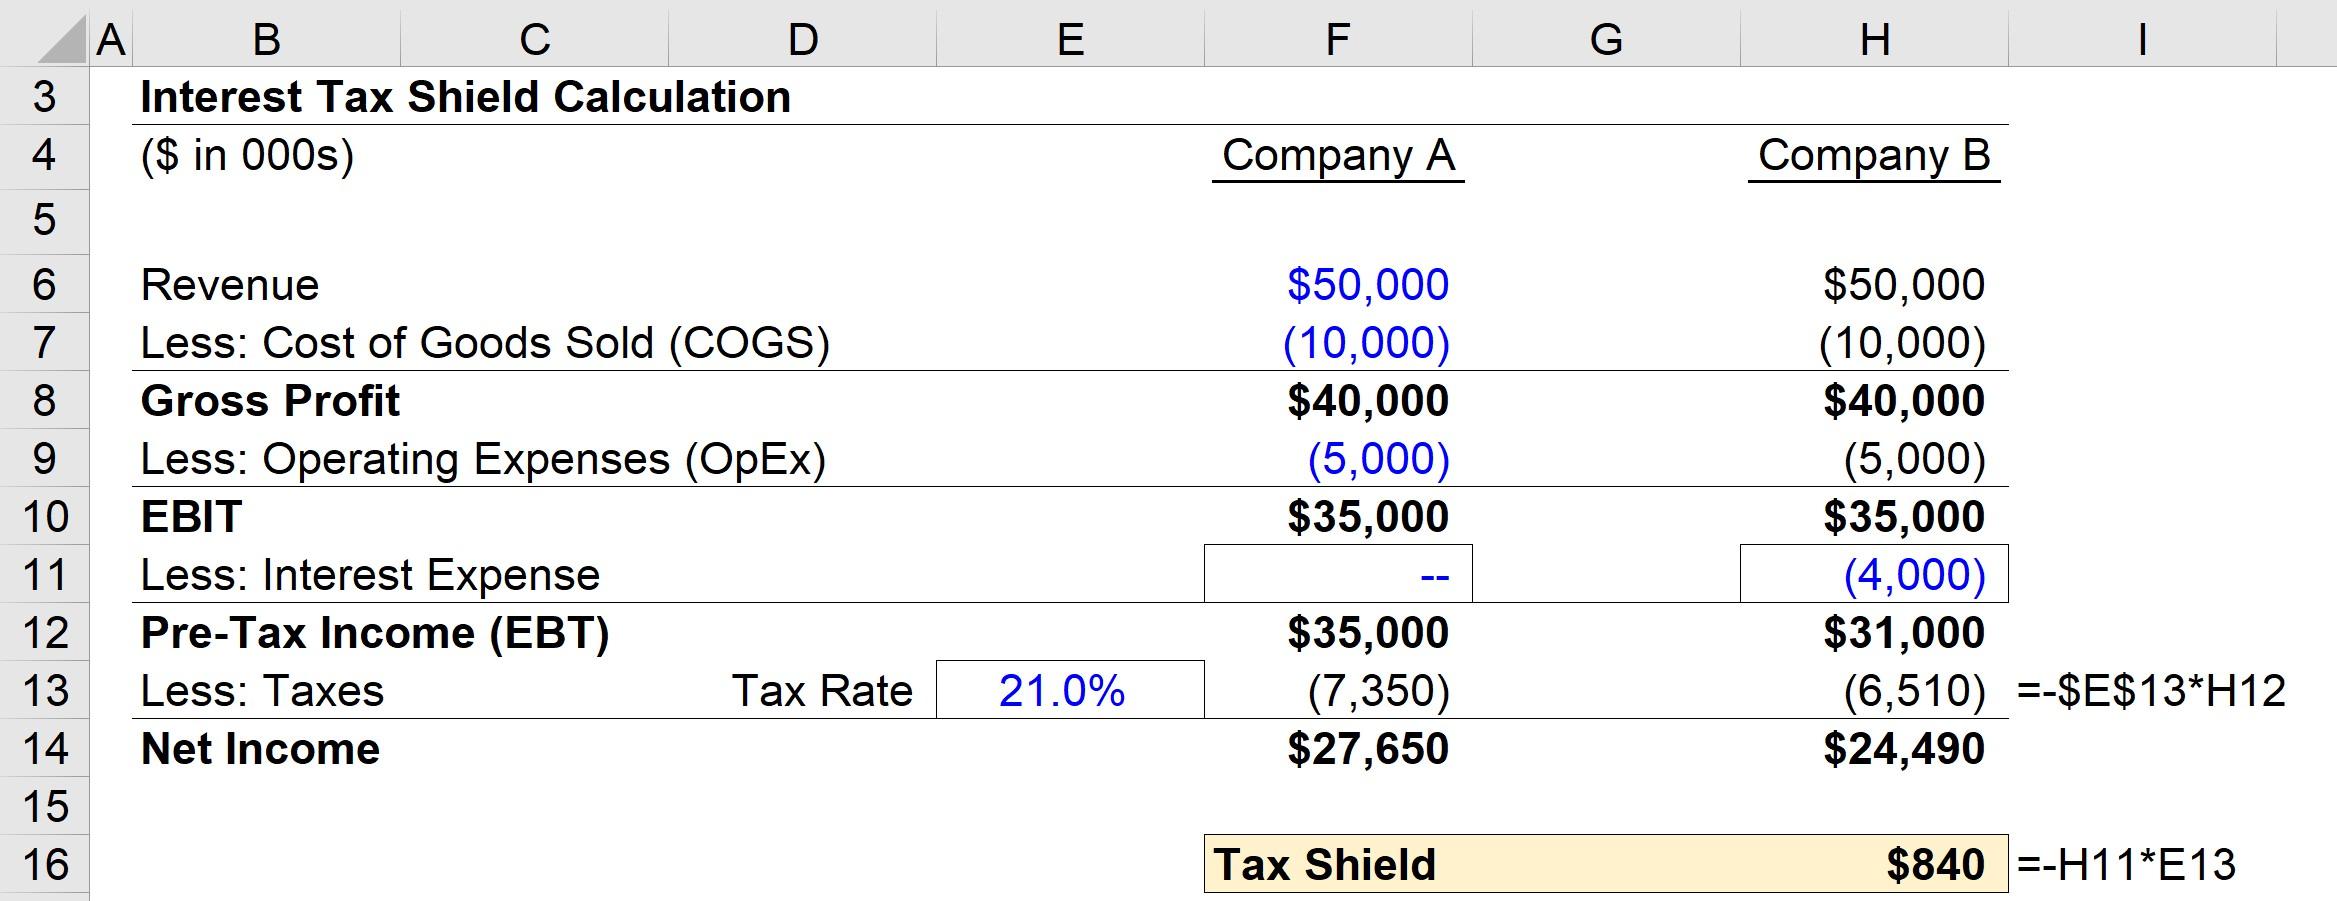 Interest Tax Shield Calculation